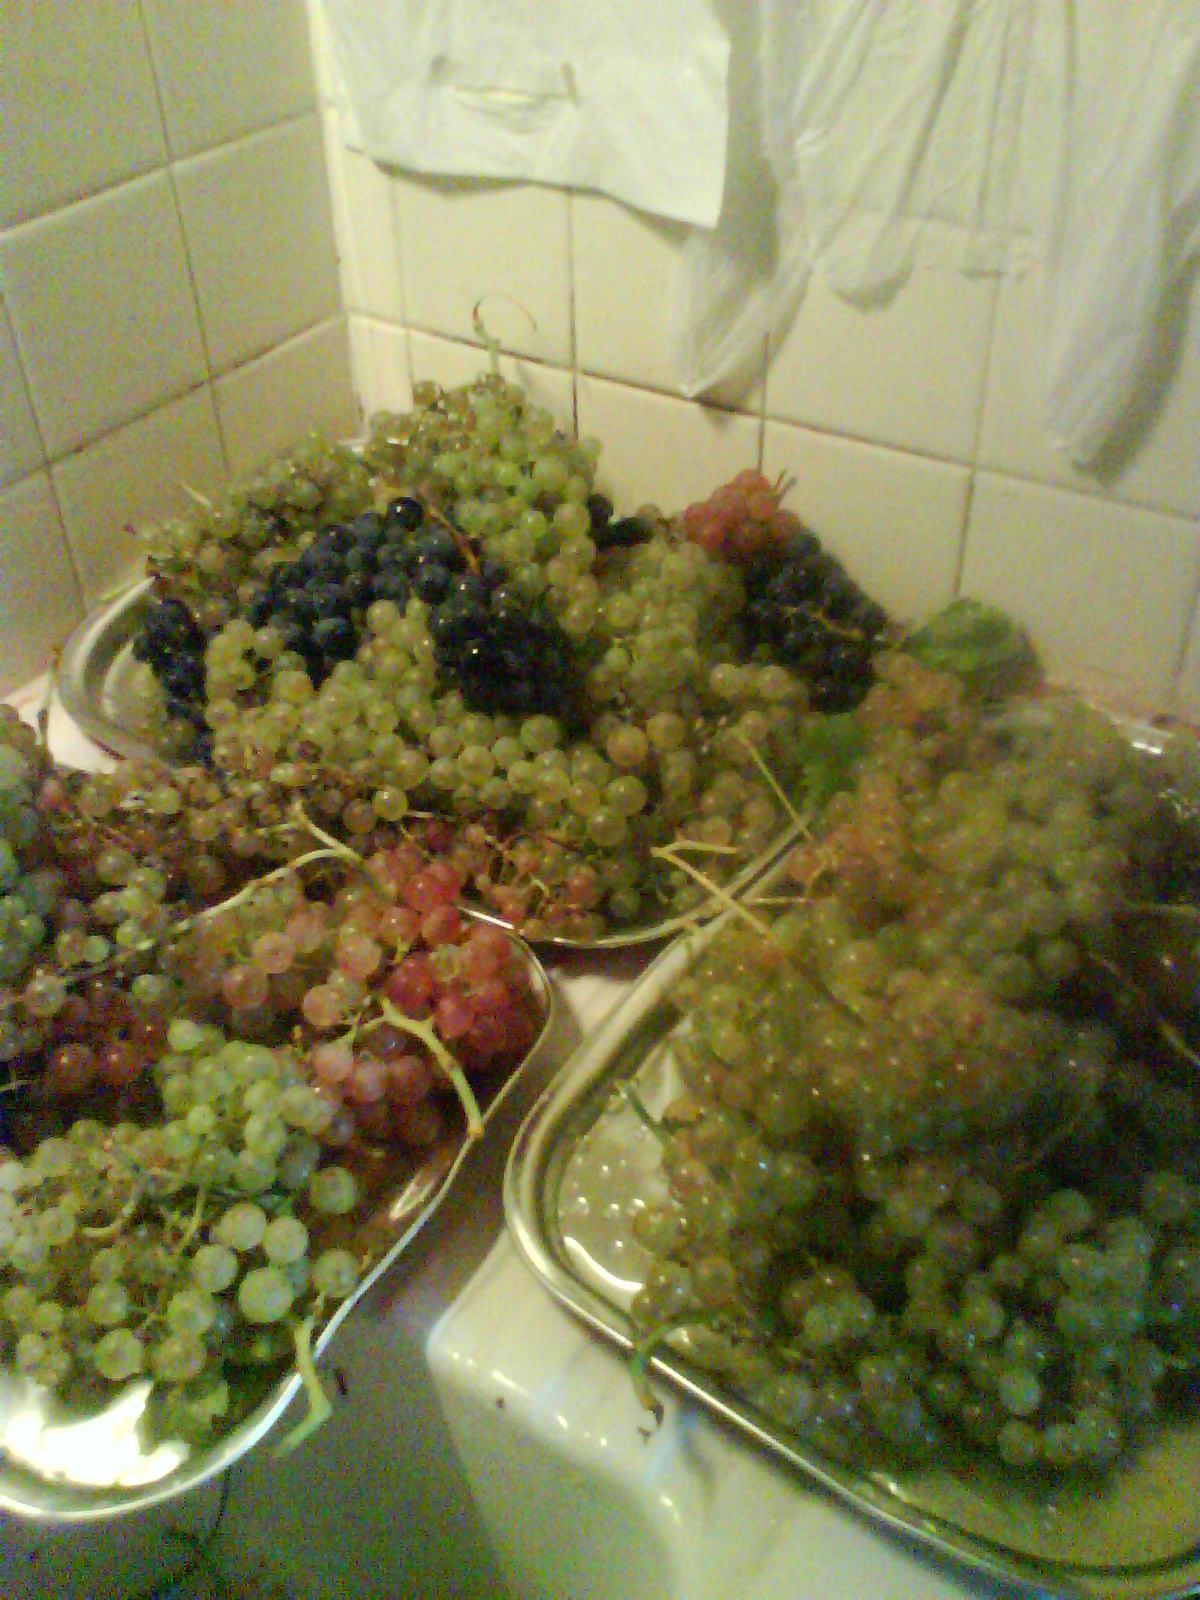 Ma cure raisin commence aujourd'hui